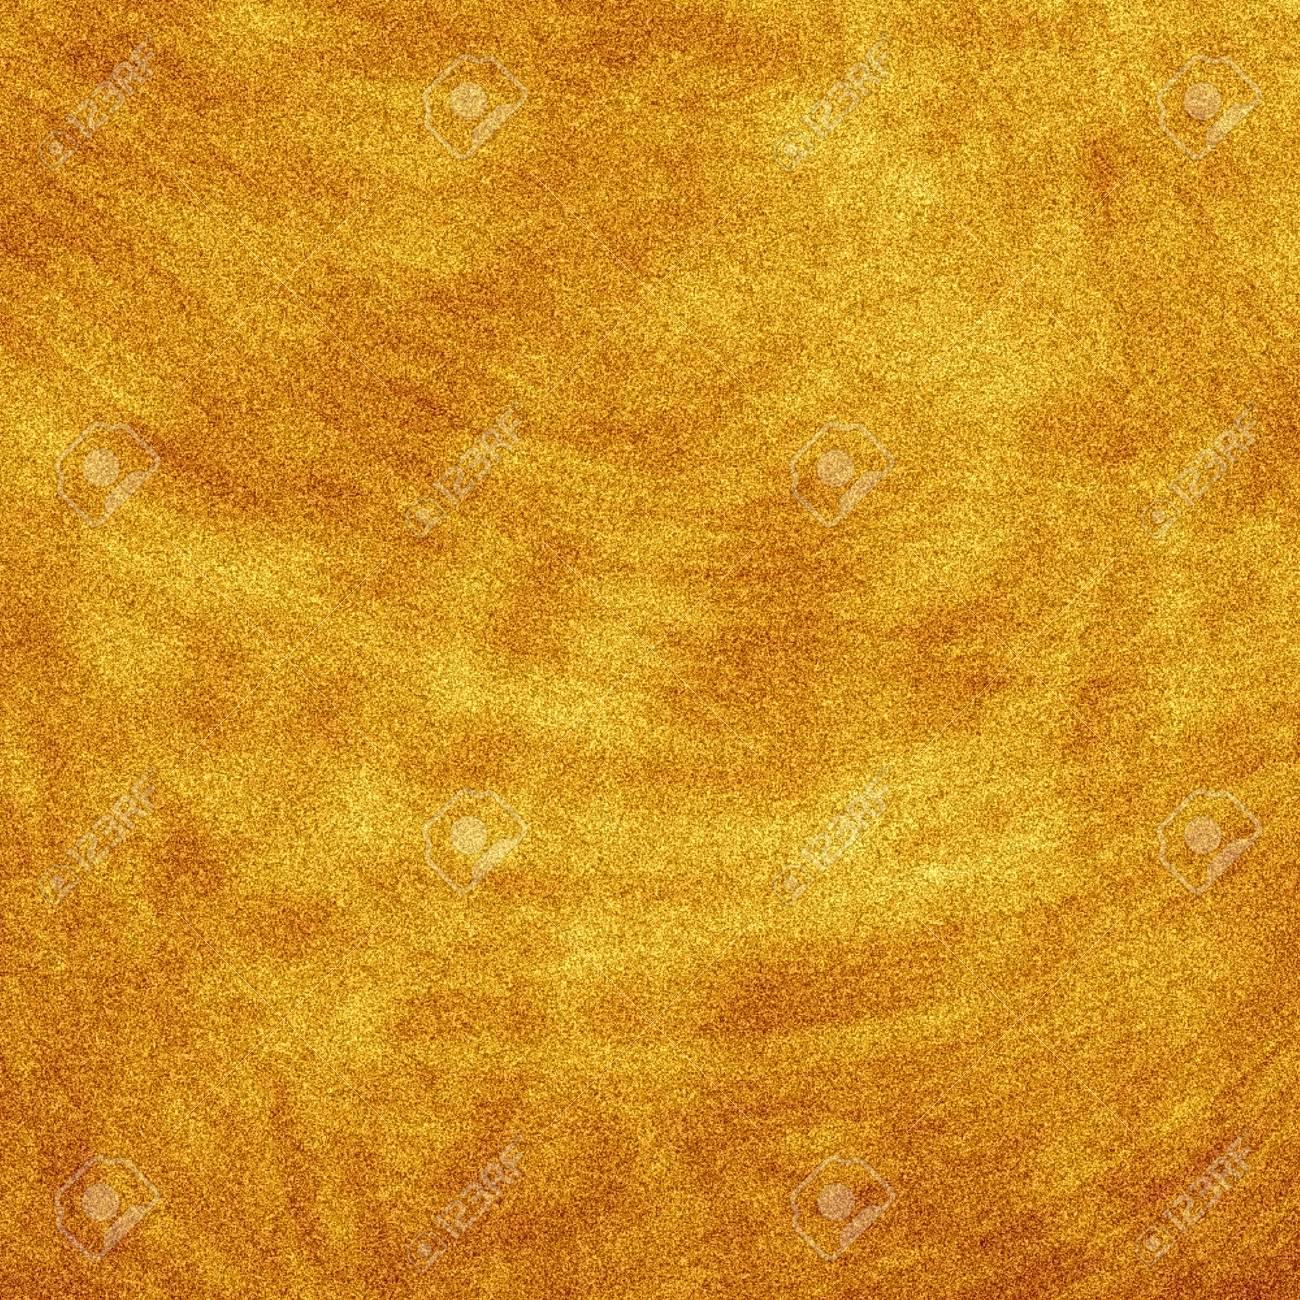 Grain Background Abstract Yellow Sand Desert Unusual Wallpaper